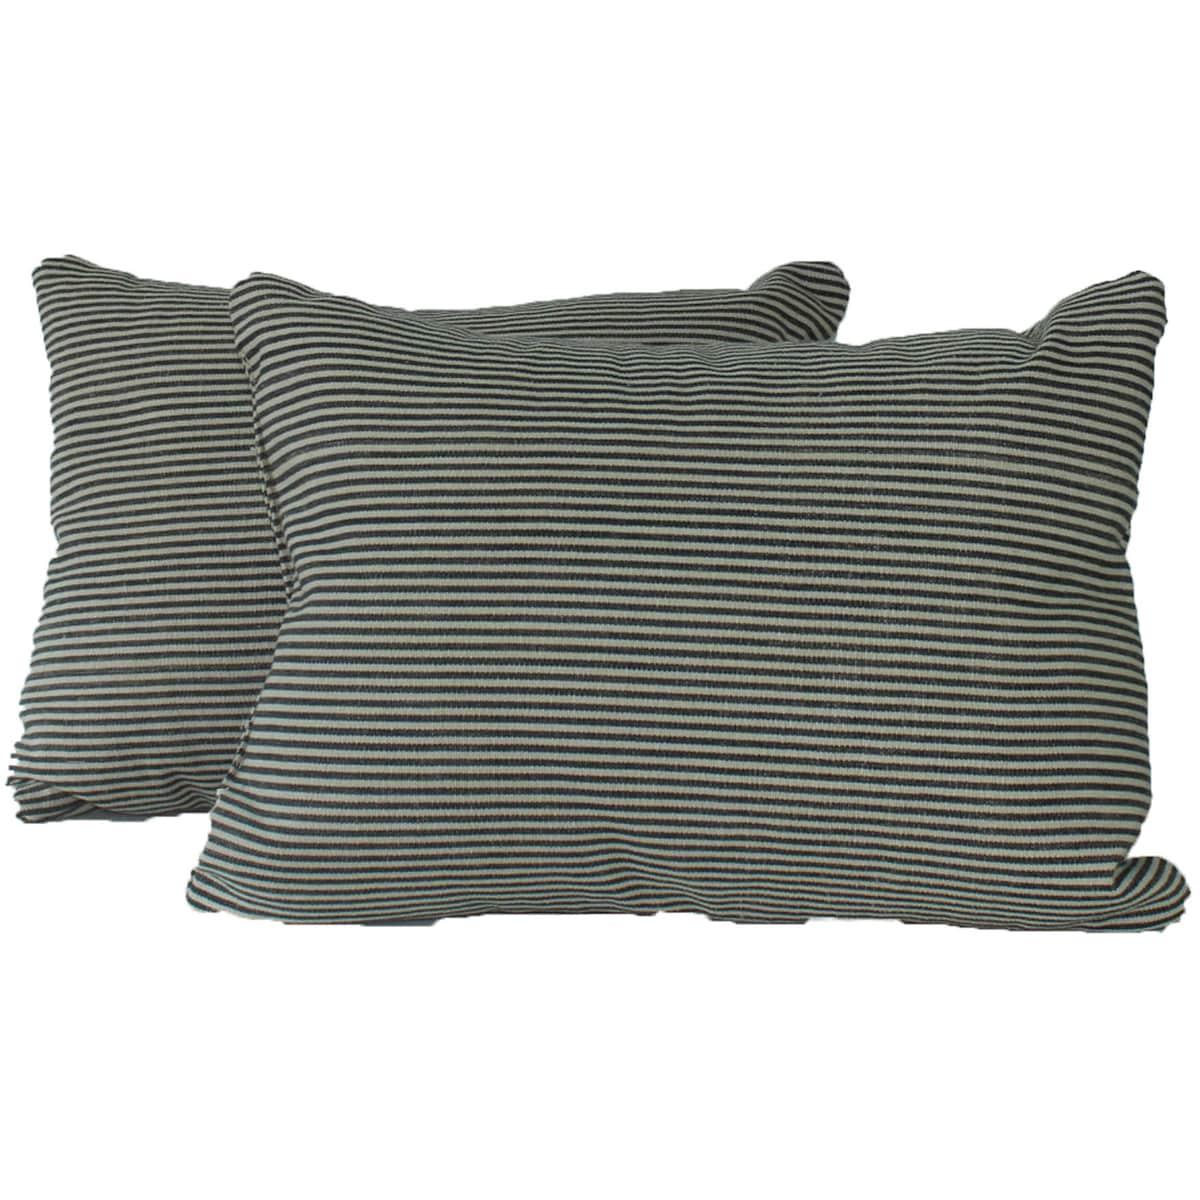 Ticking Black Throw Pillows (Set of 2)